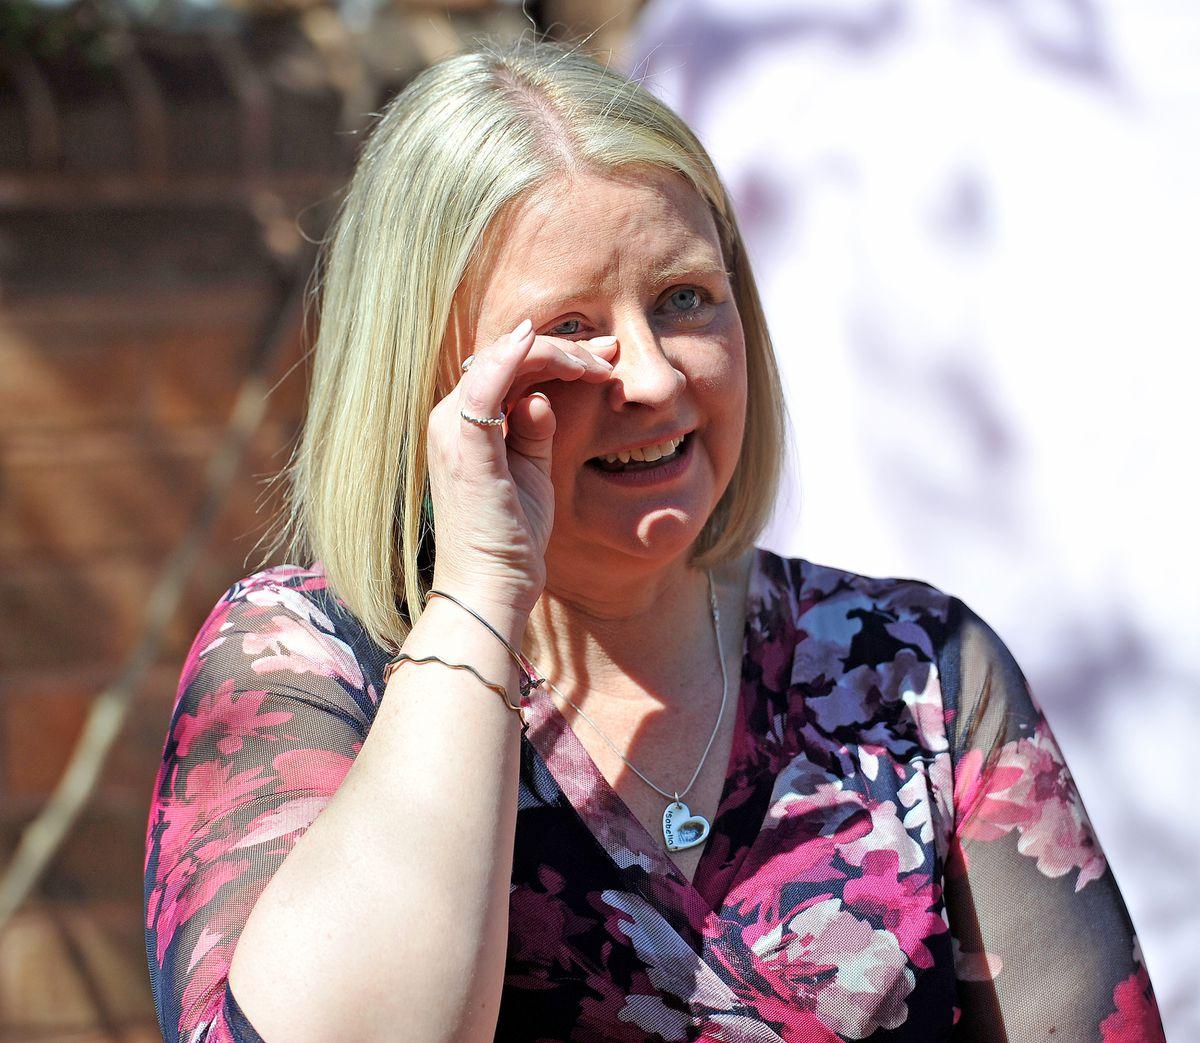 An emotional Jen Dalton at the event..